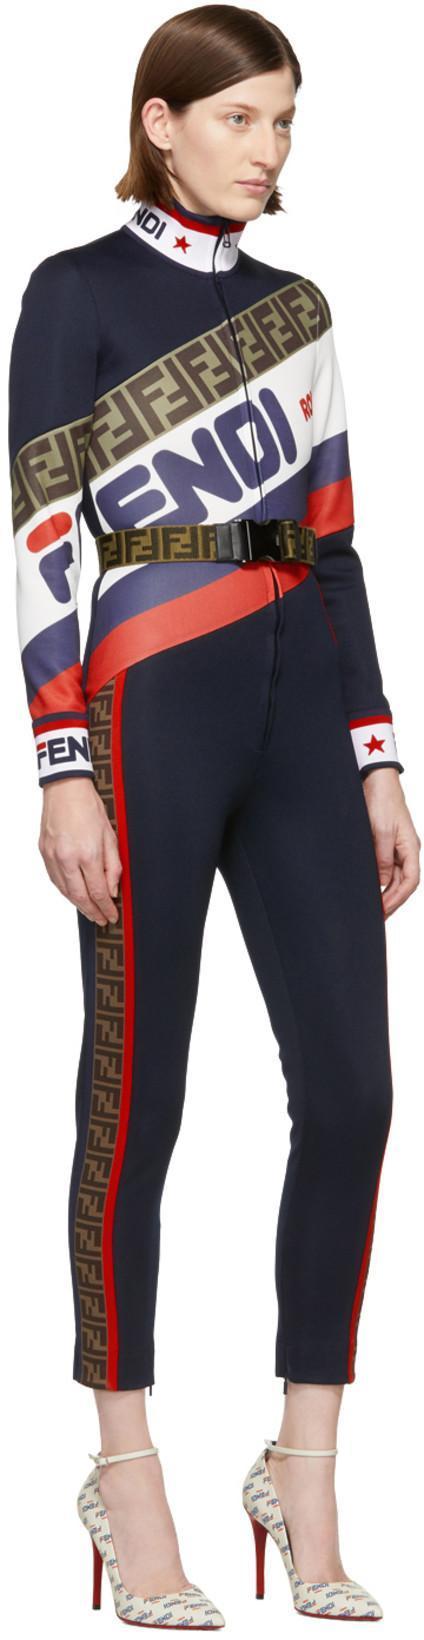 ce6132244a90 FENDI Fendi - Mania Logo Piqué Jersey Jumpsuit - Womens - Navy Multi